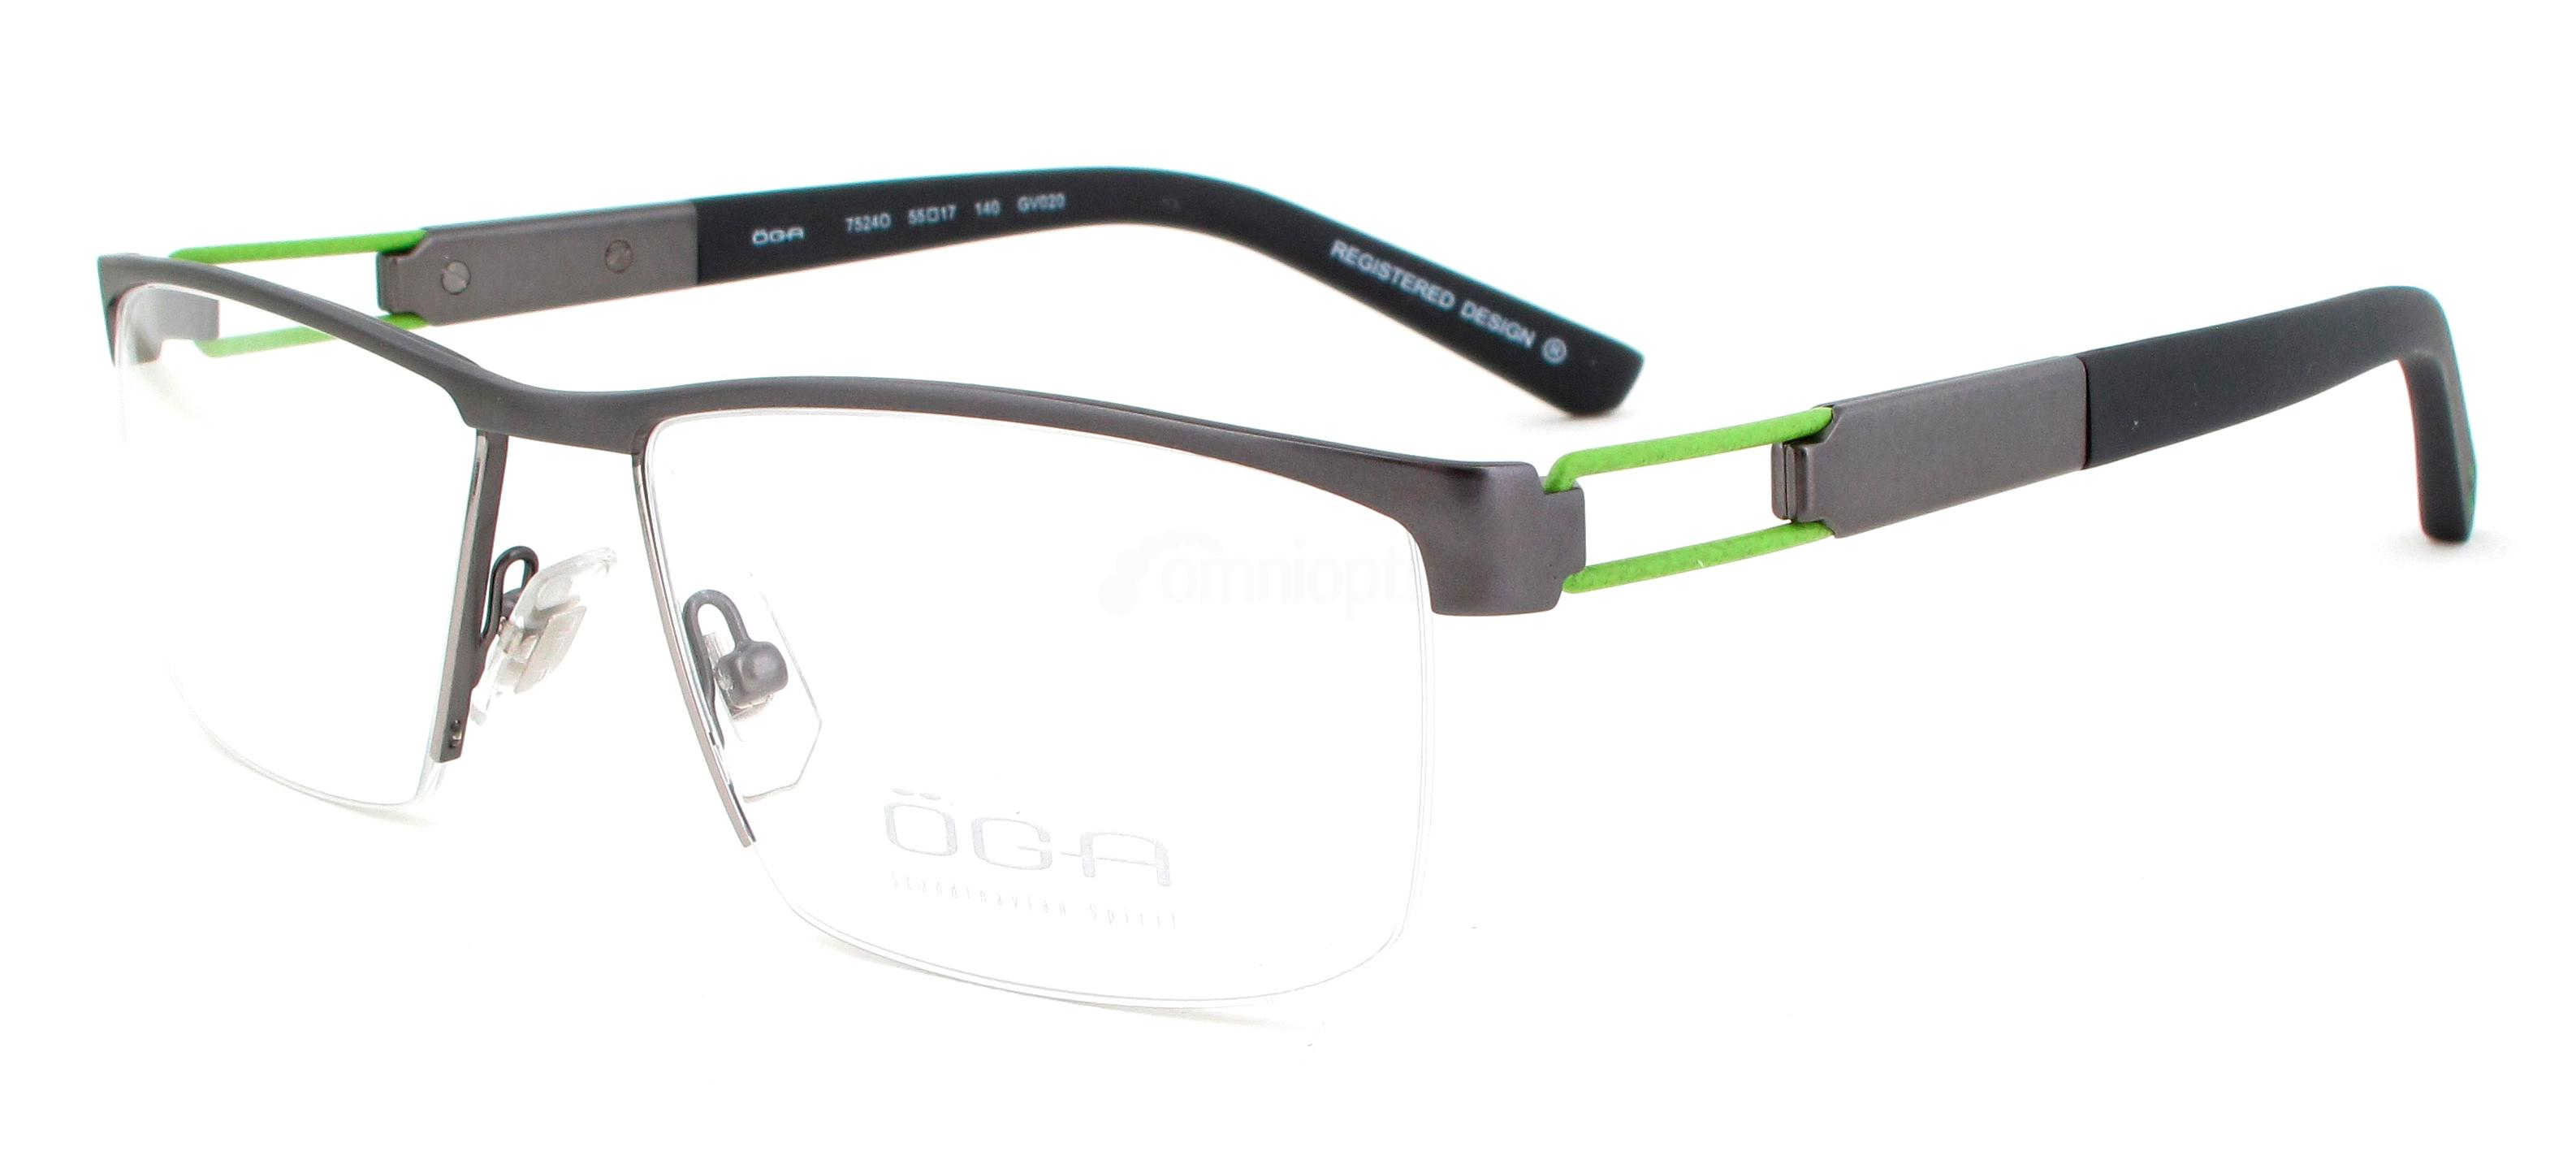 GV020 7524O TRAD 3 Glasses, ÖGA Scandinavian Spirit